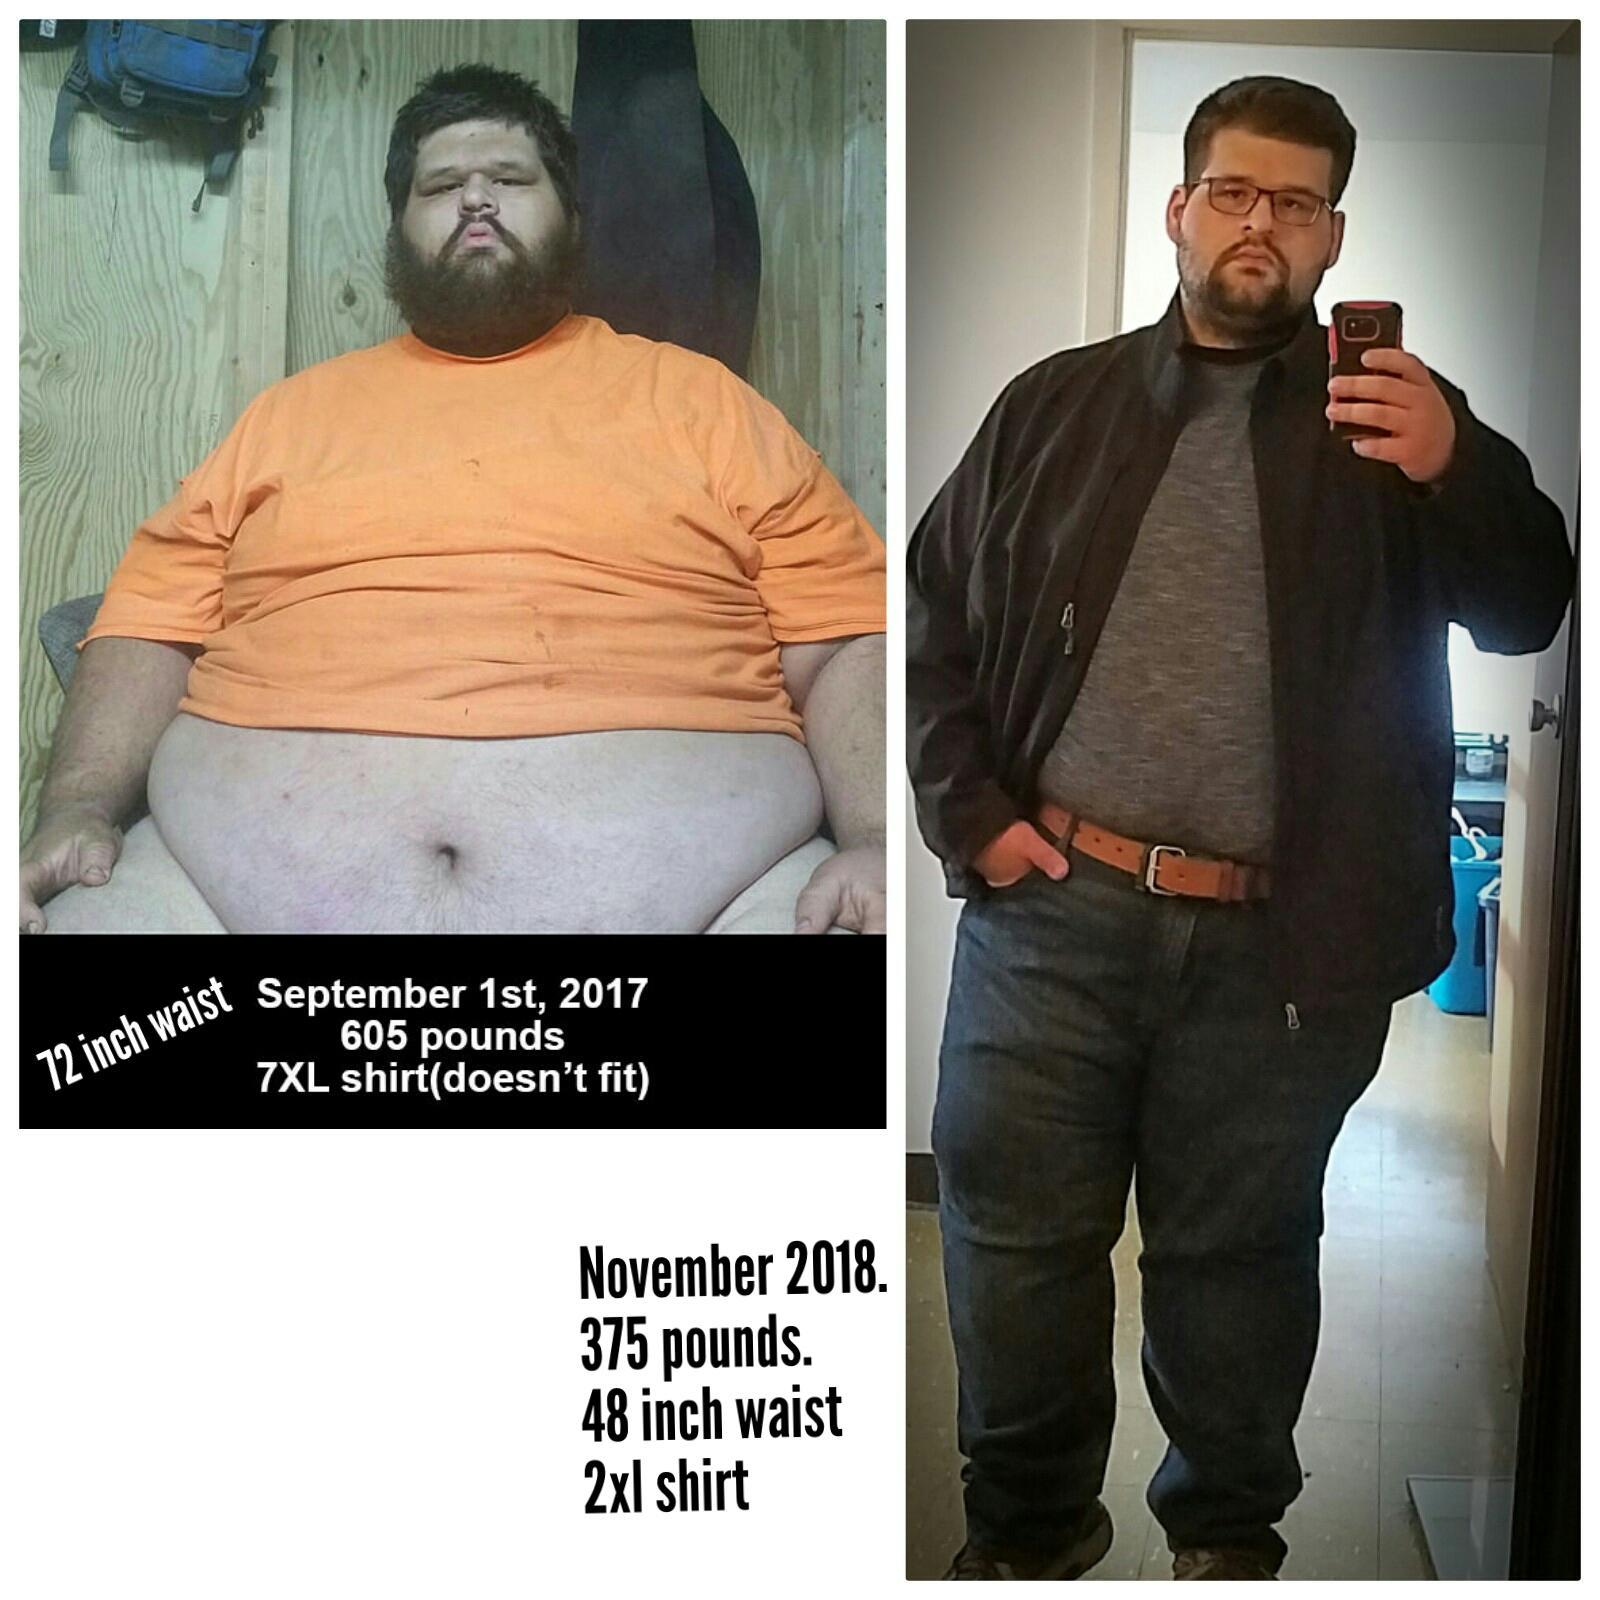 Progress Pics of 230 lbs Weight Loss 5'11 Male 605 lbs to 375 lbs